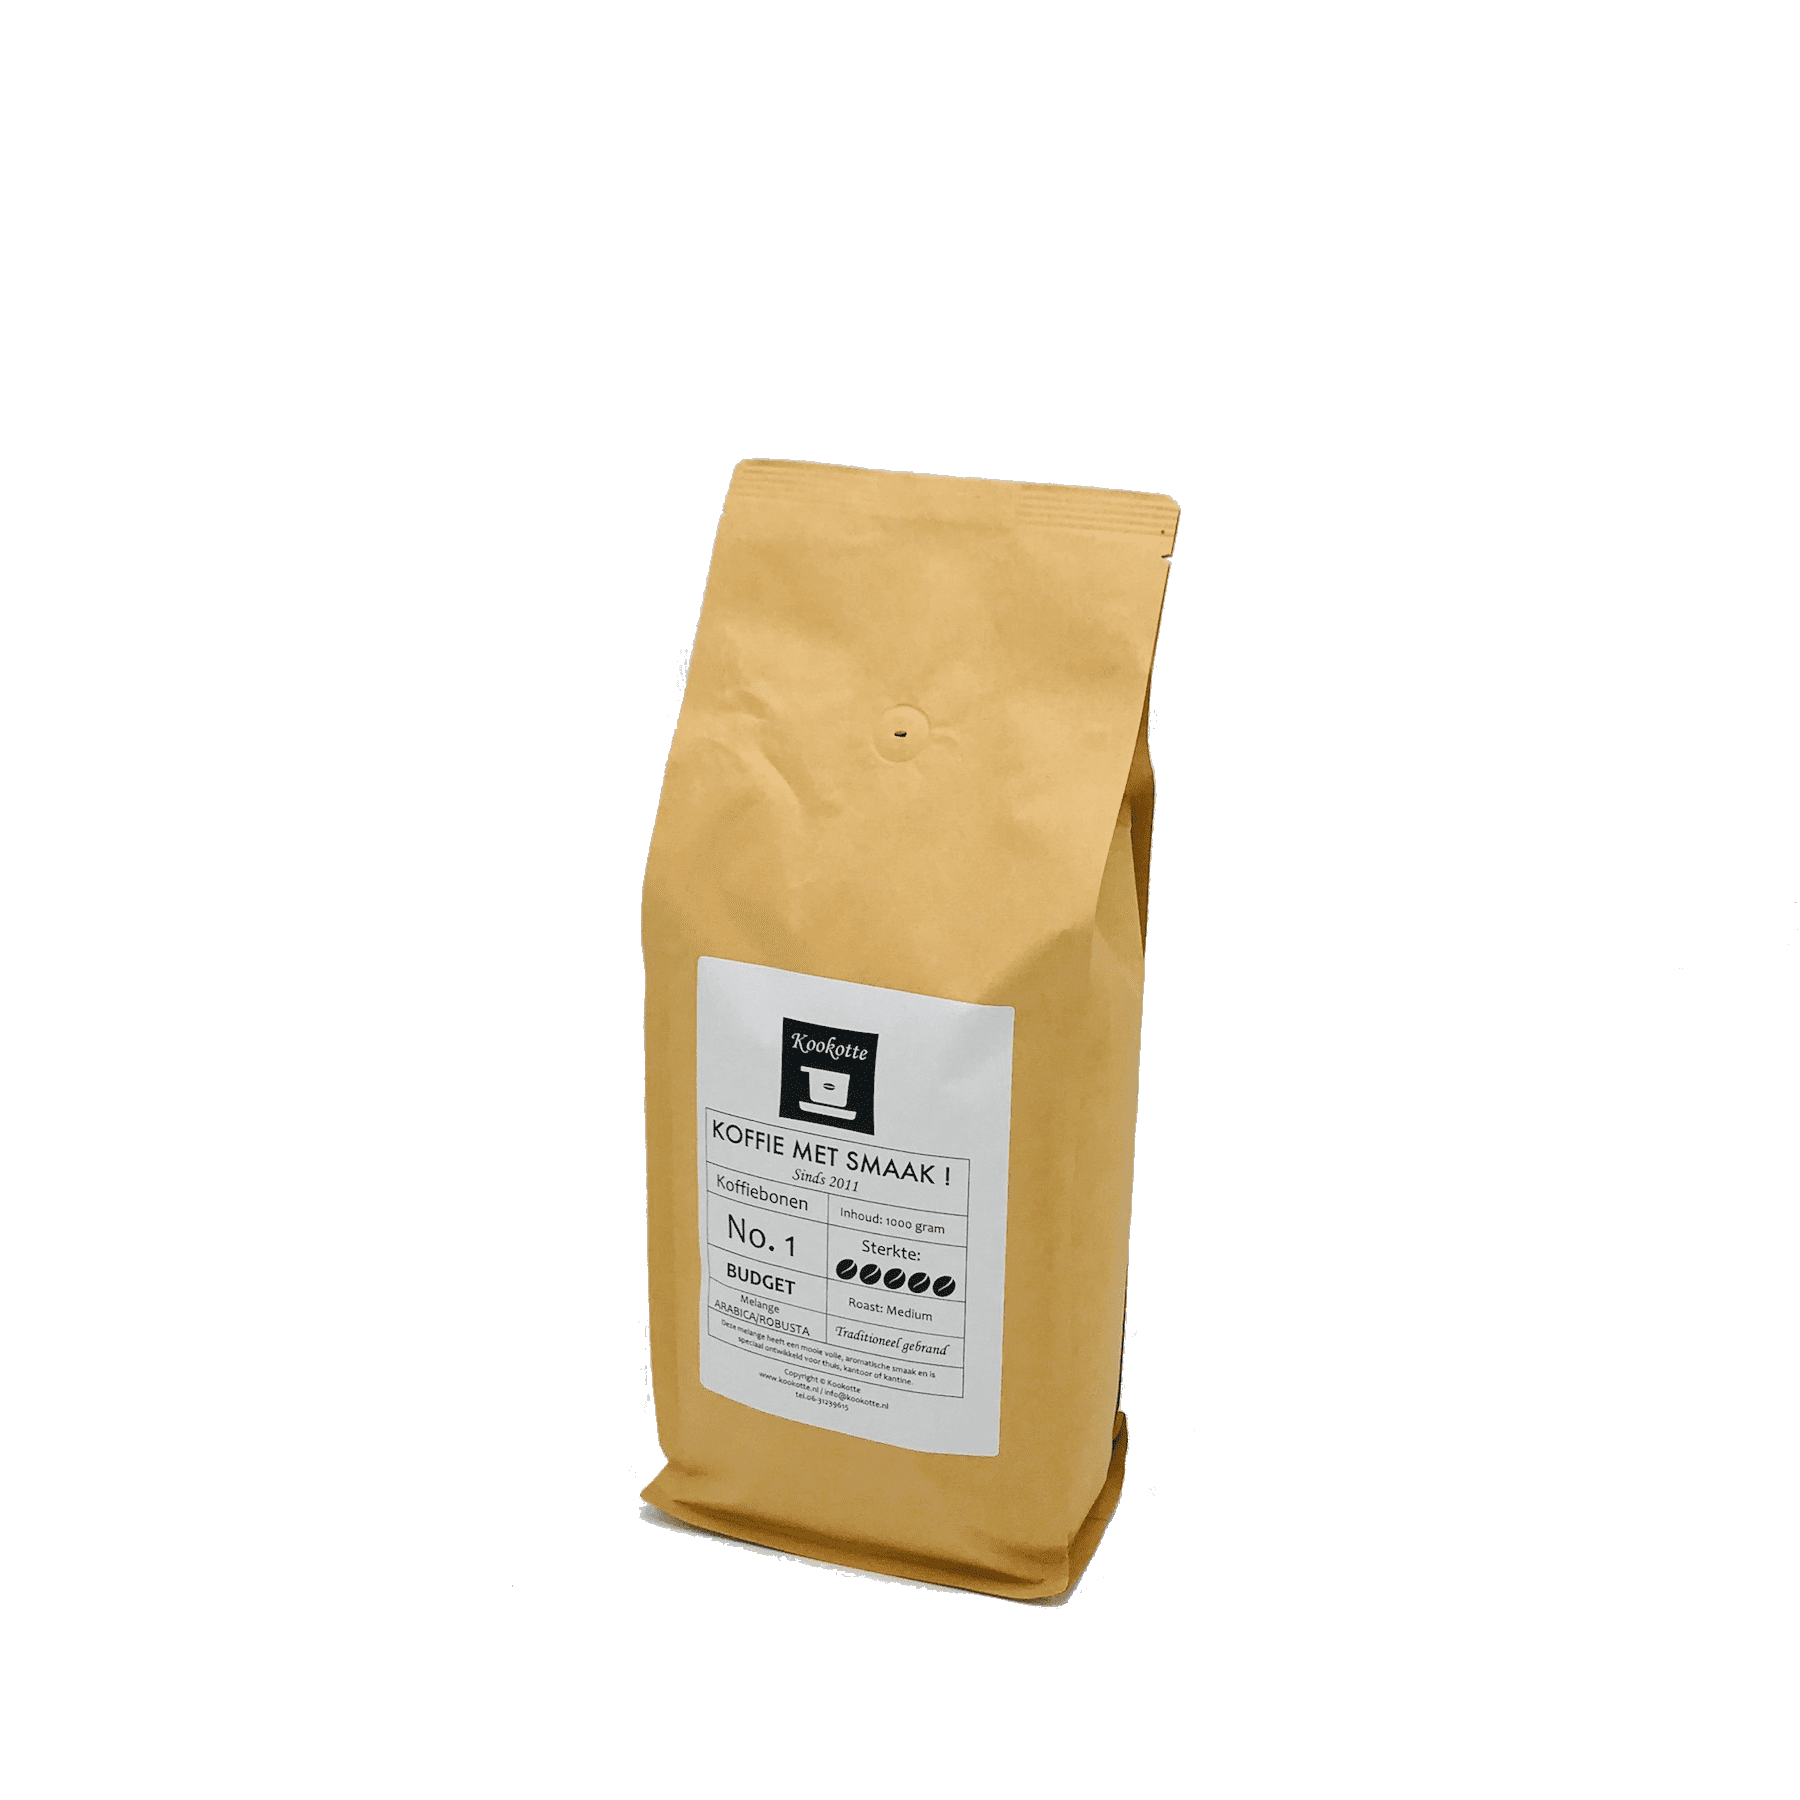 Koffiebonen No.1